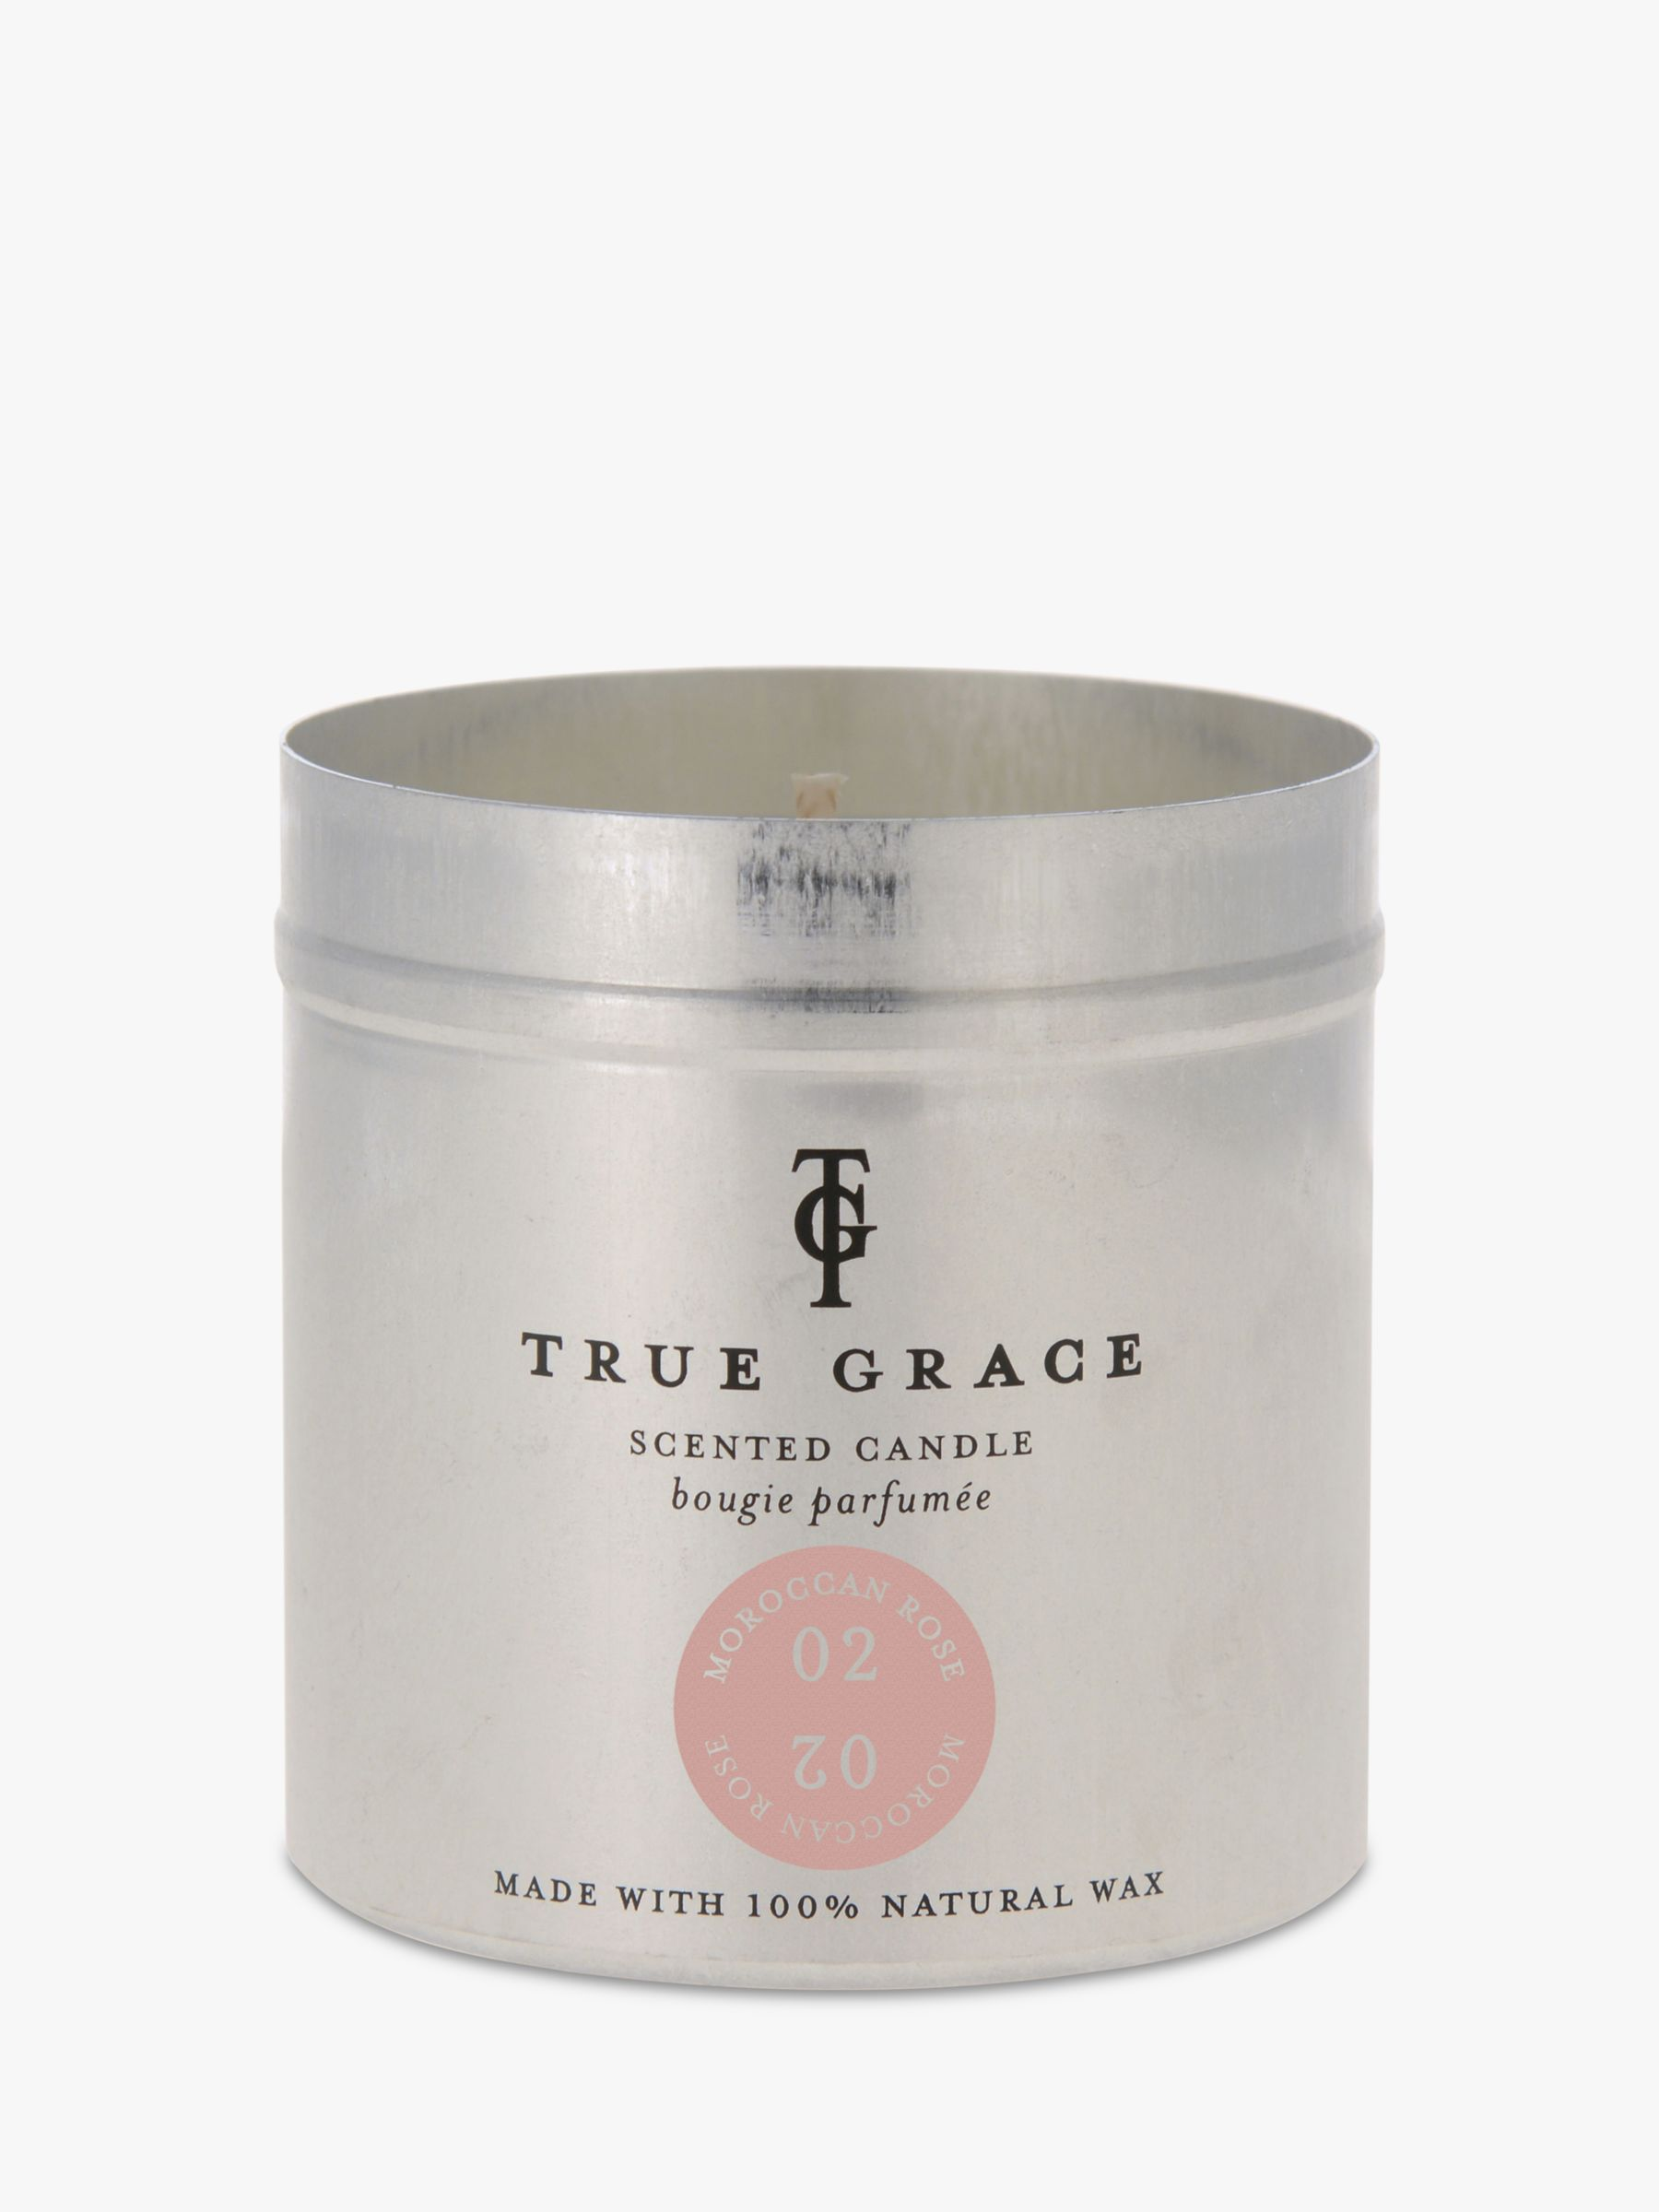 True Grace True Grace Village Moroccan Rose Scented Candle Tin